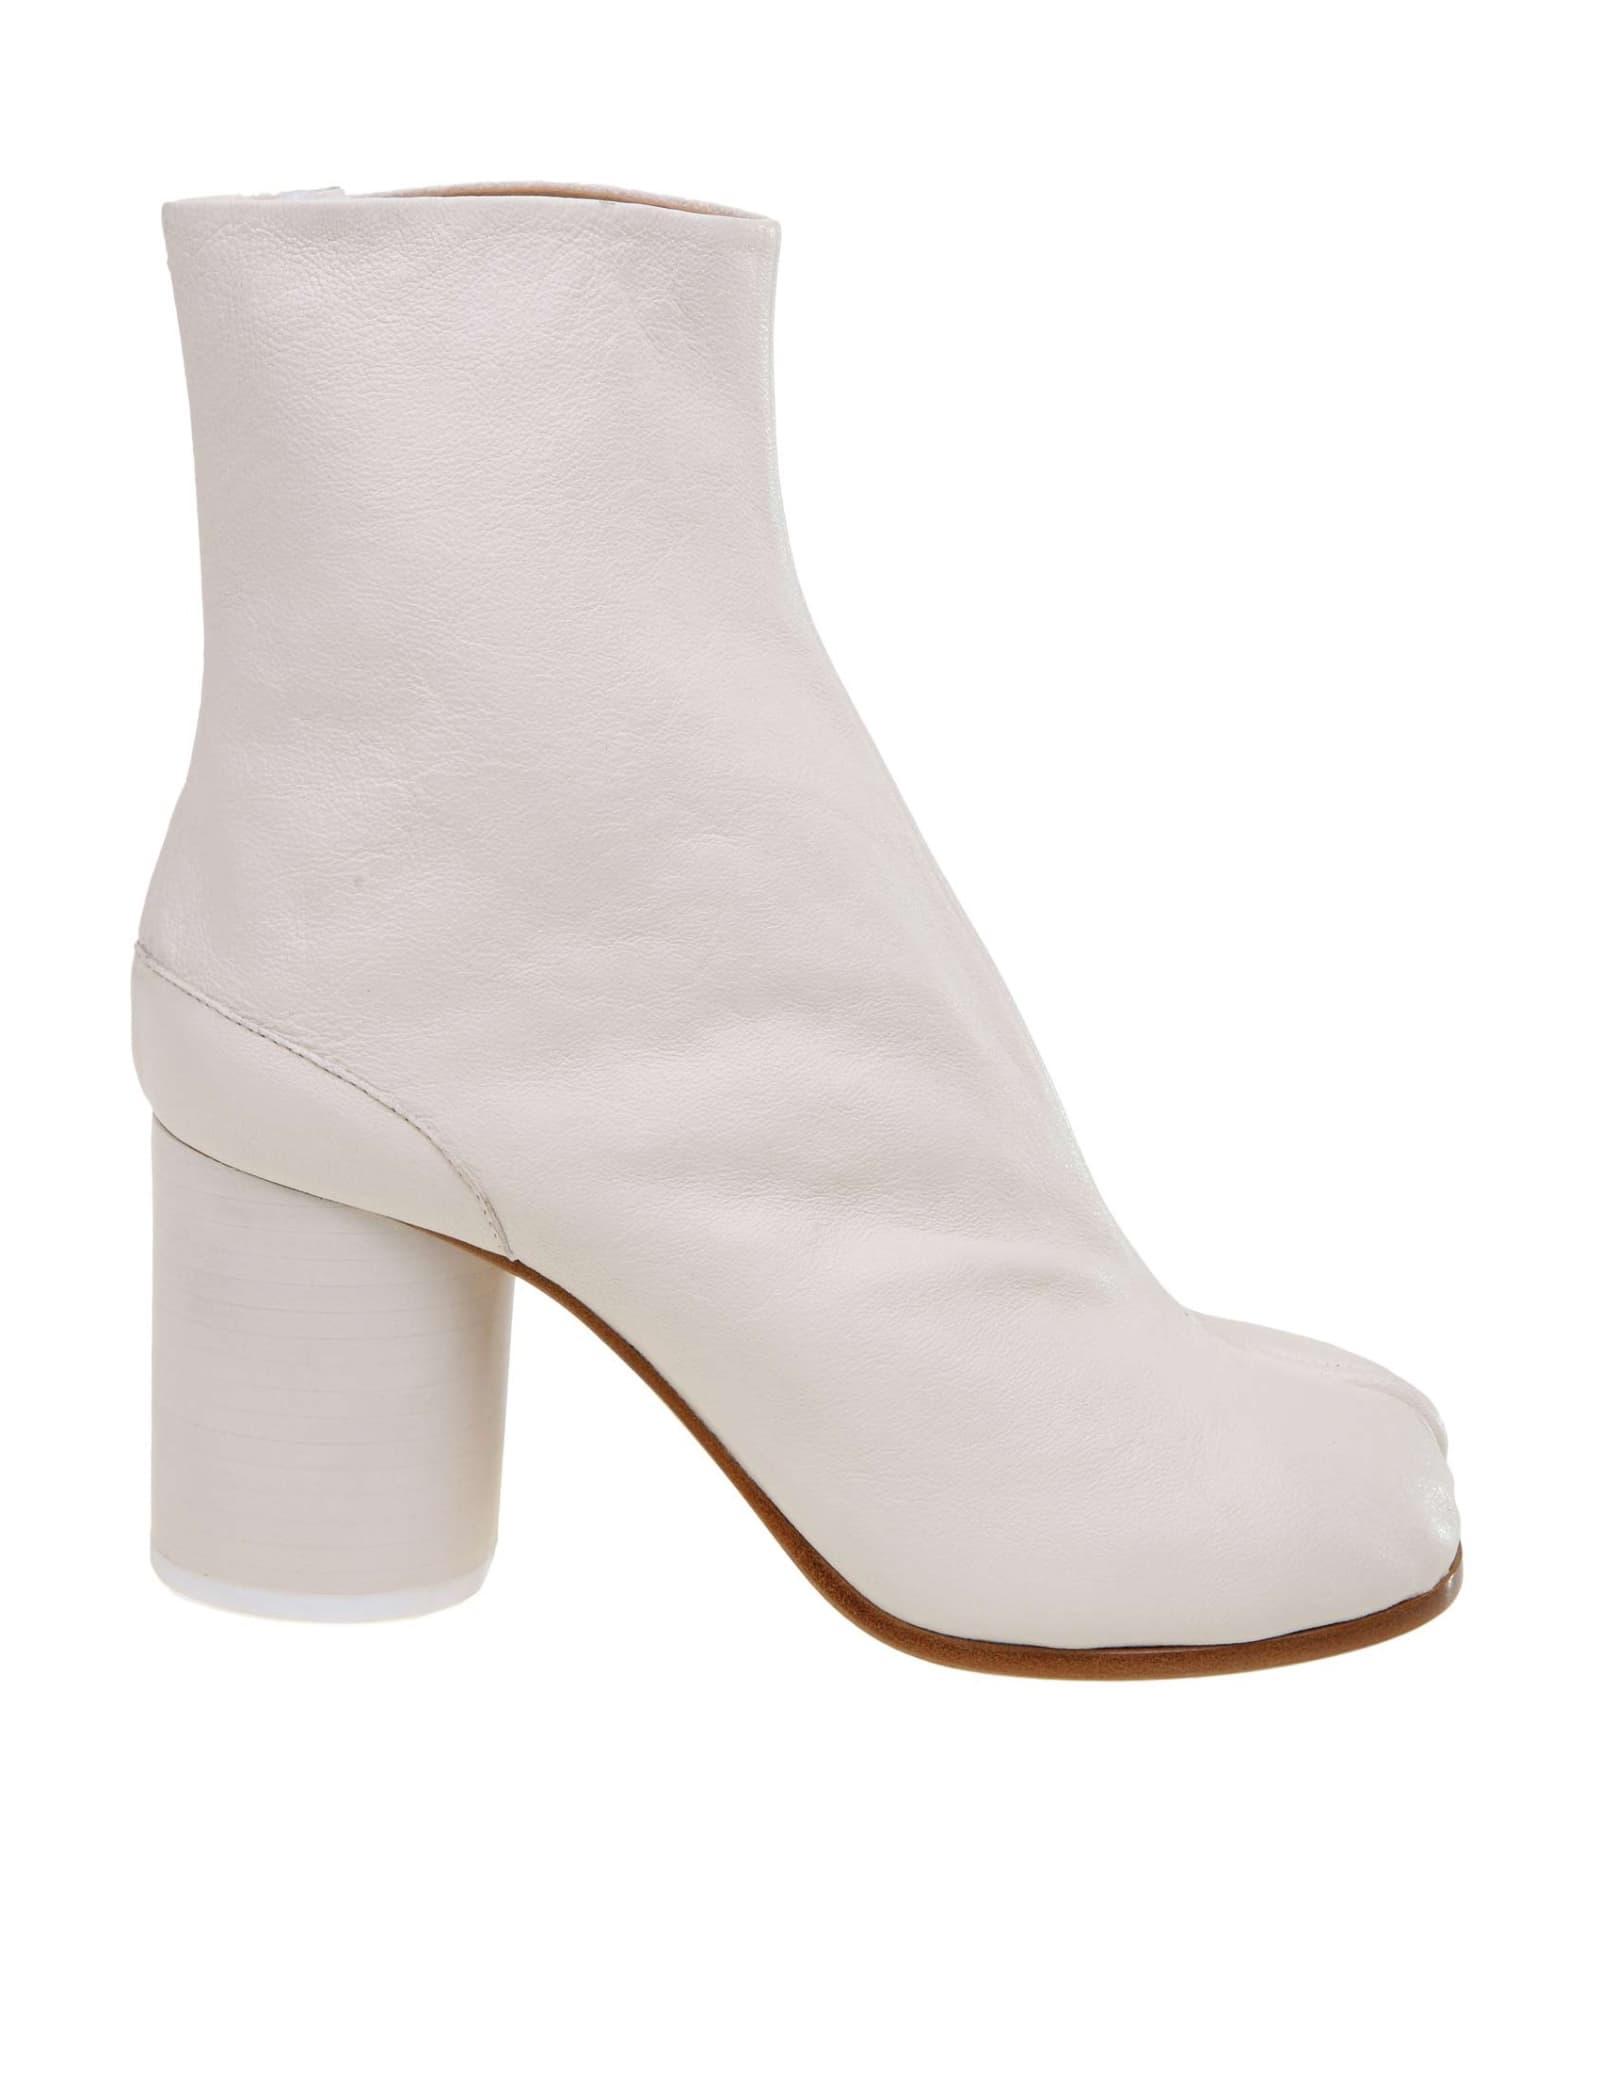 Maison Margiela Tabi Boots In Soft White Nappa